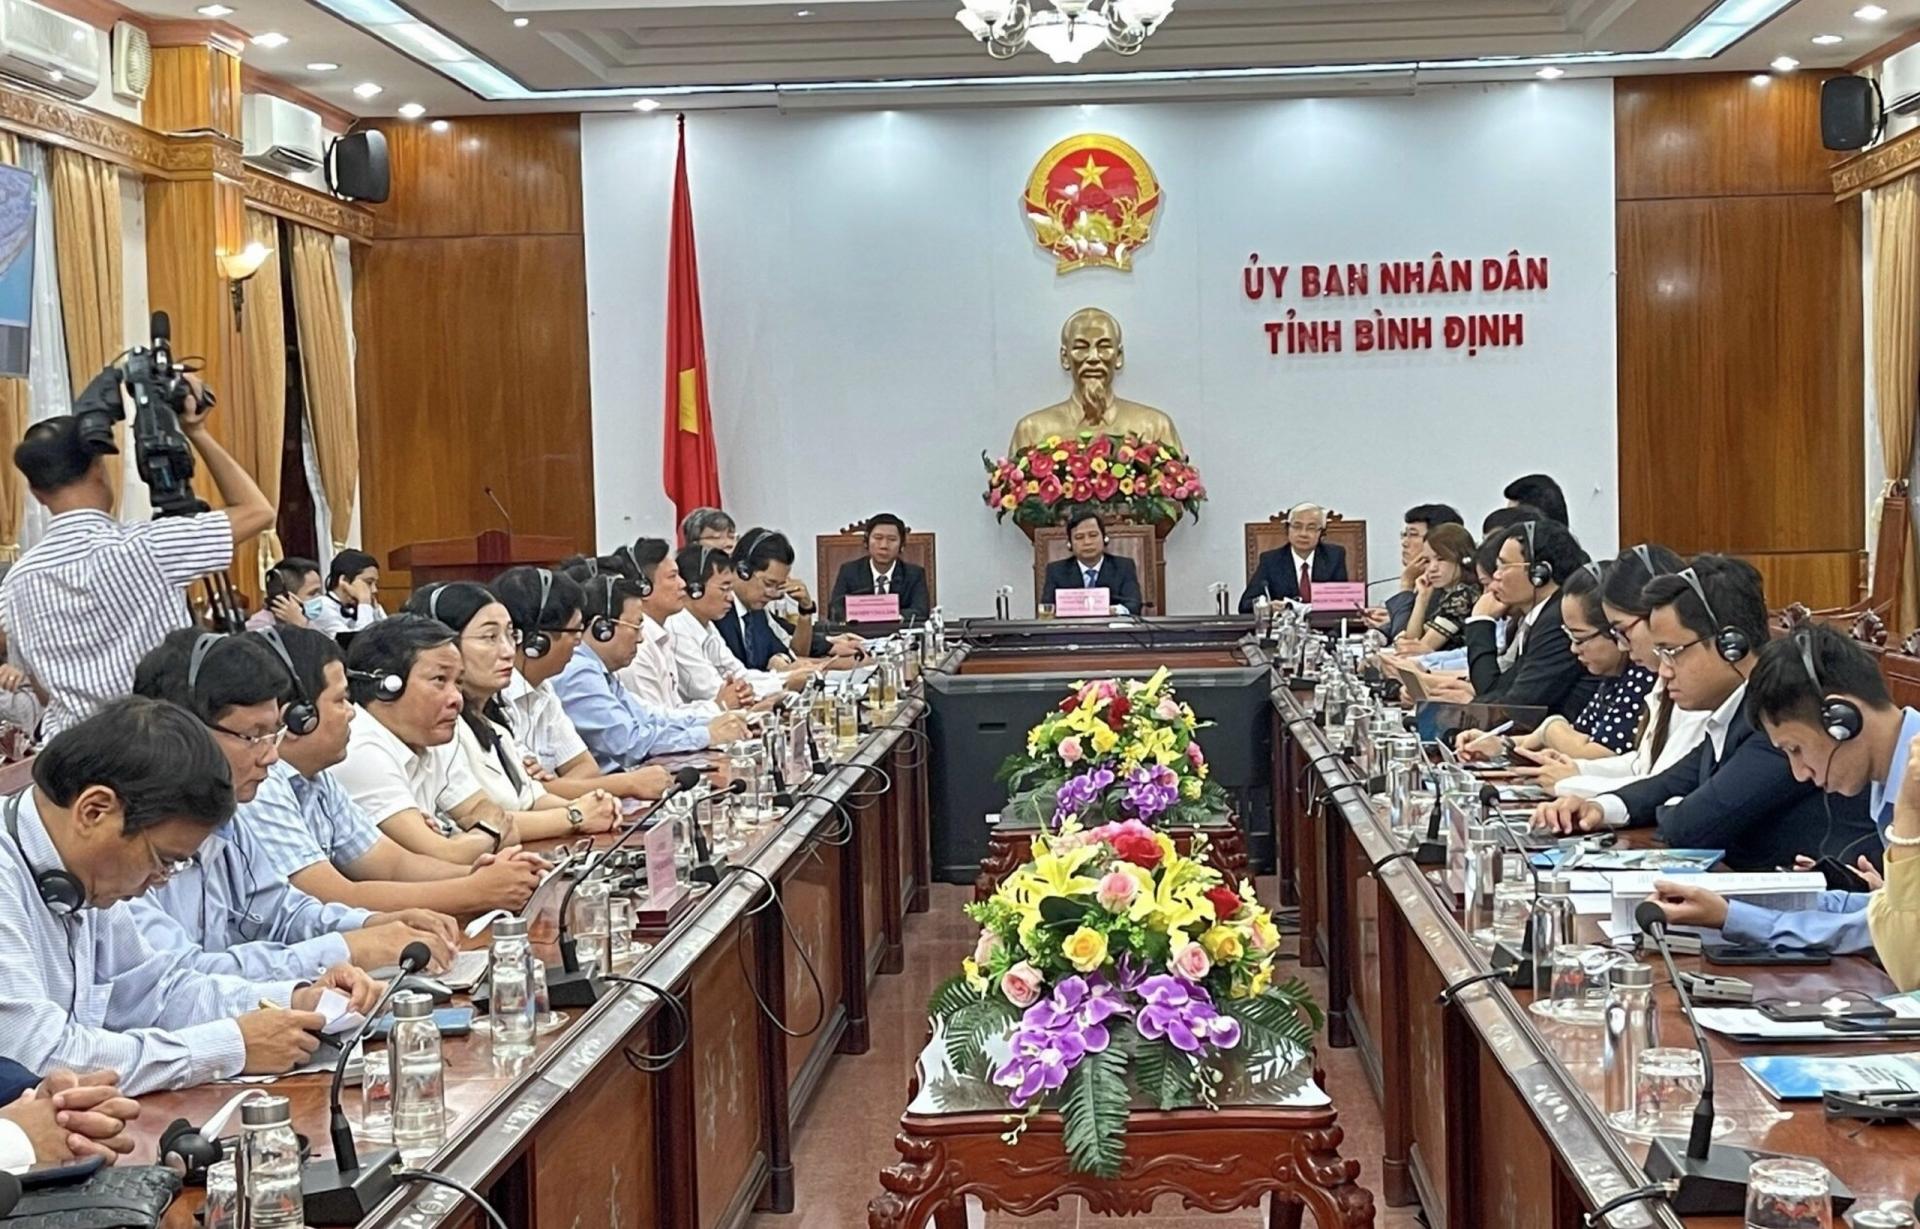 becamex vsip binh dinh elevates economic development in central region